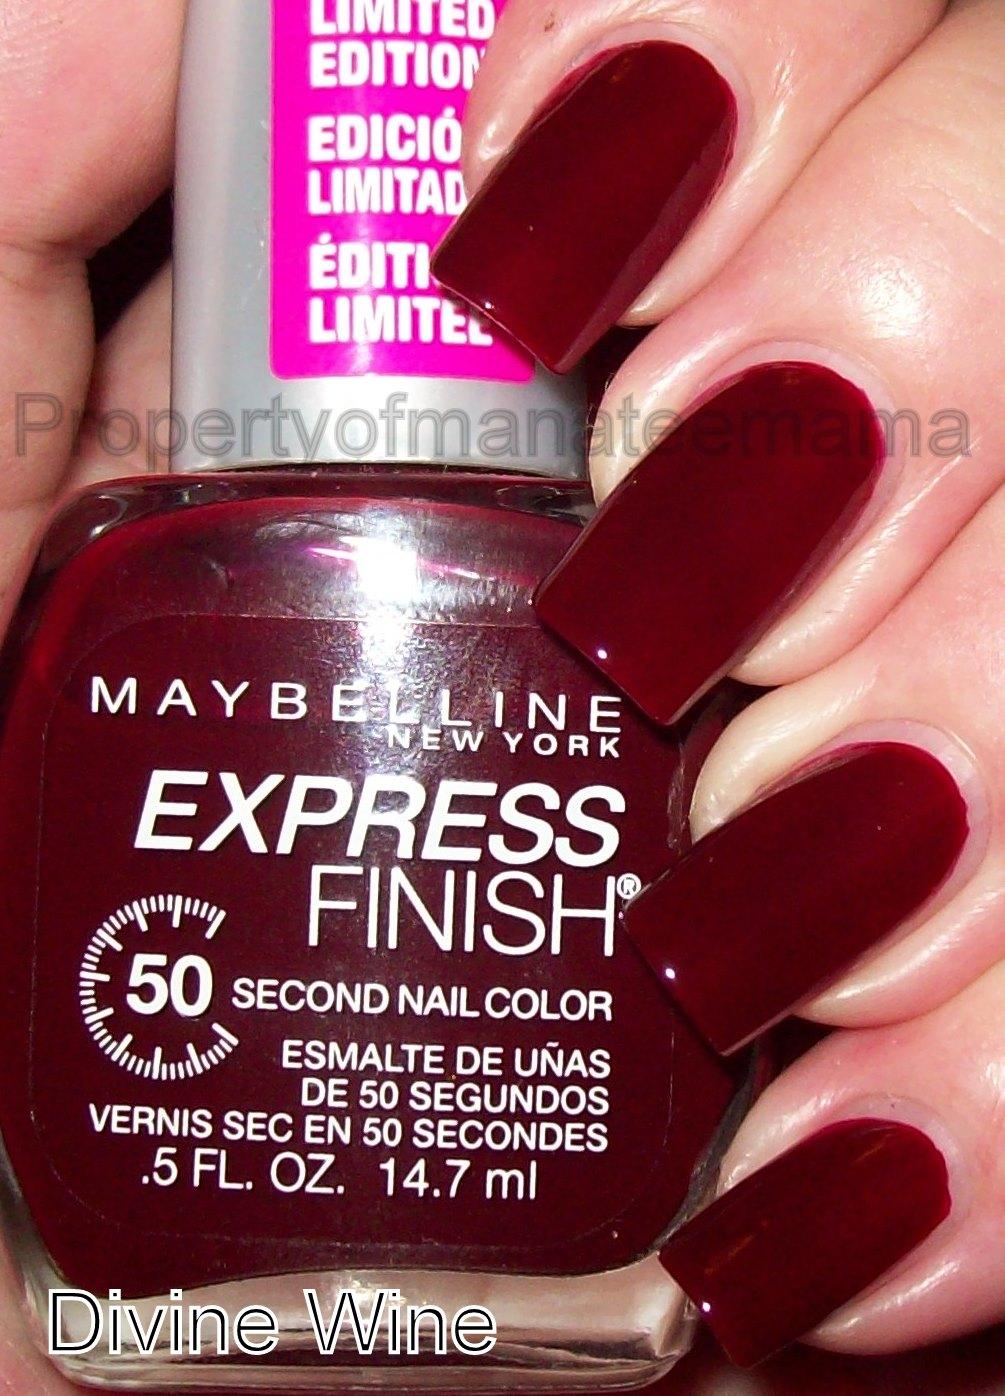 Maybelline Express Finish Nail Polish Divine Wine - Ad#: 1591257 ...